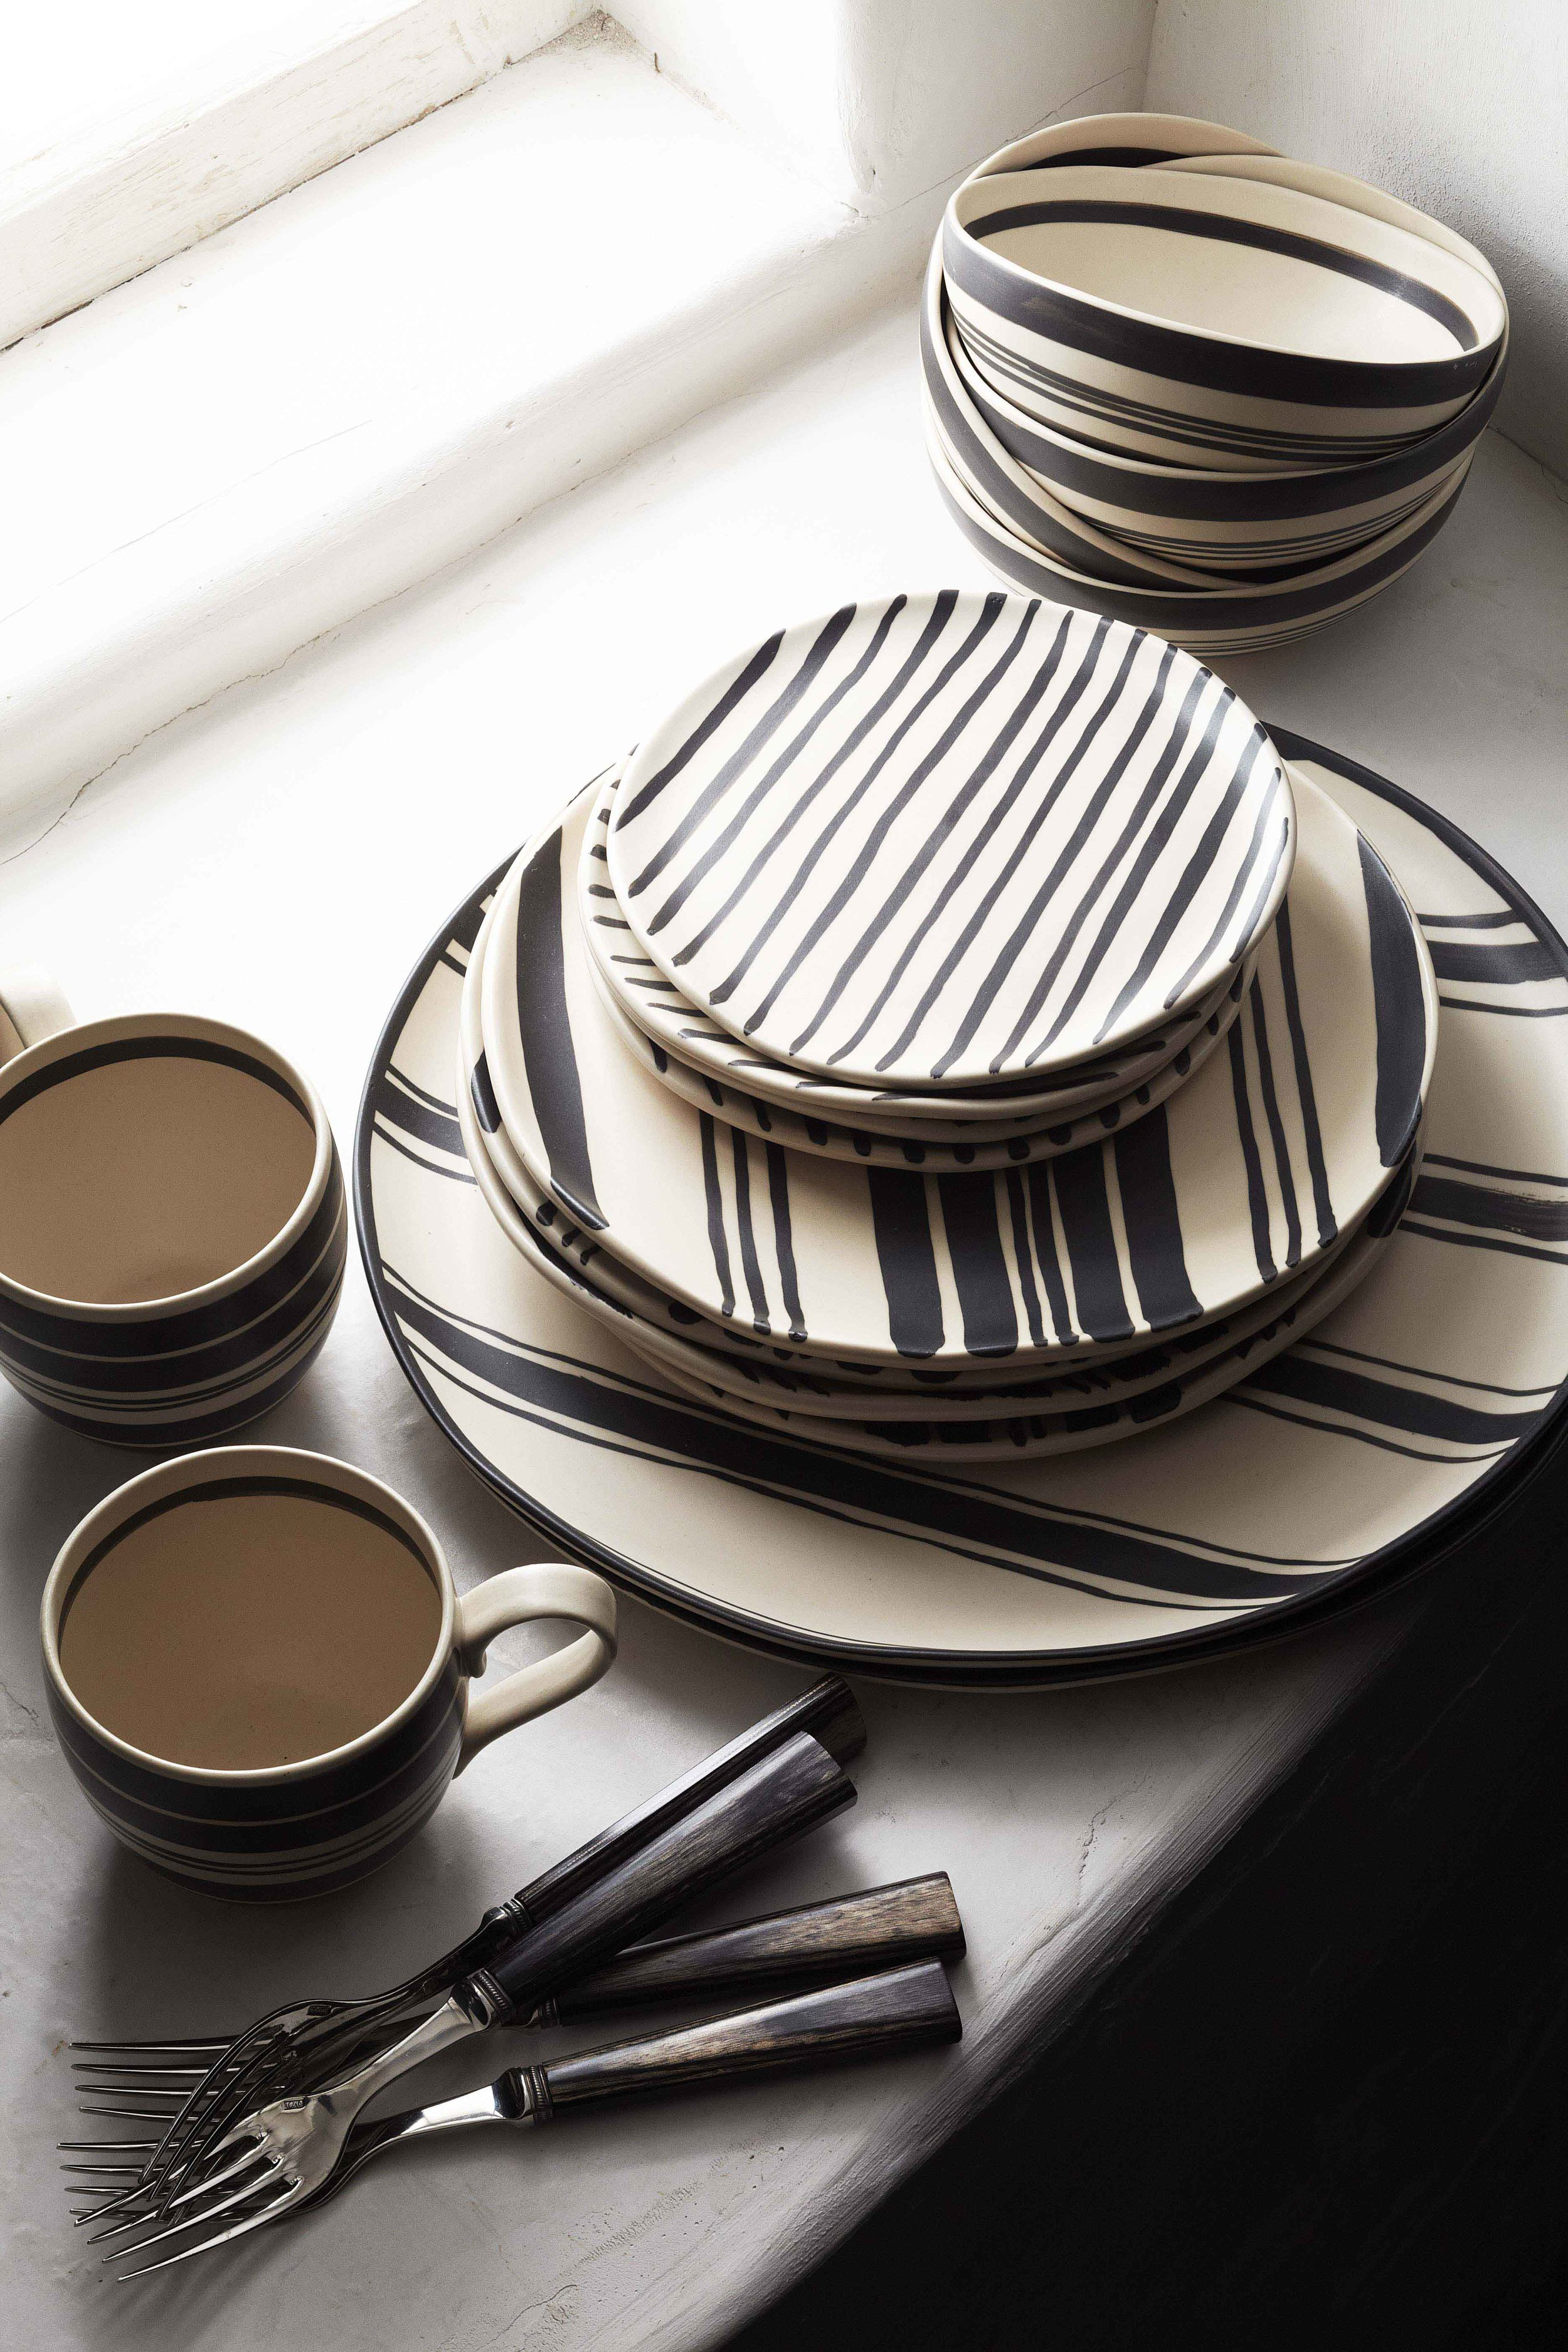 Wythe dinnerware $45-$150 and Zen flatware $295 (five-piece setting)